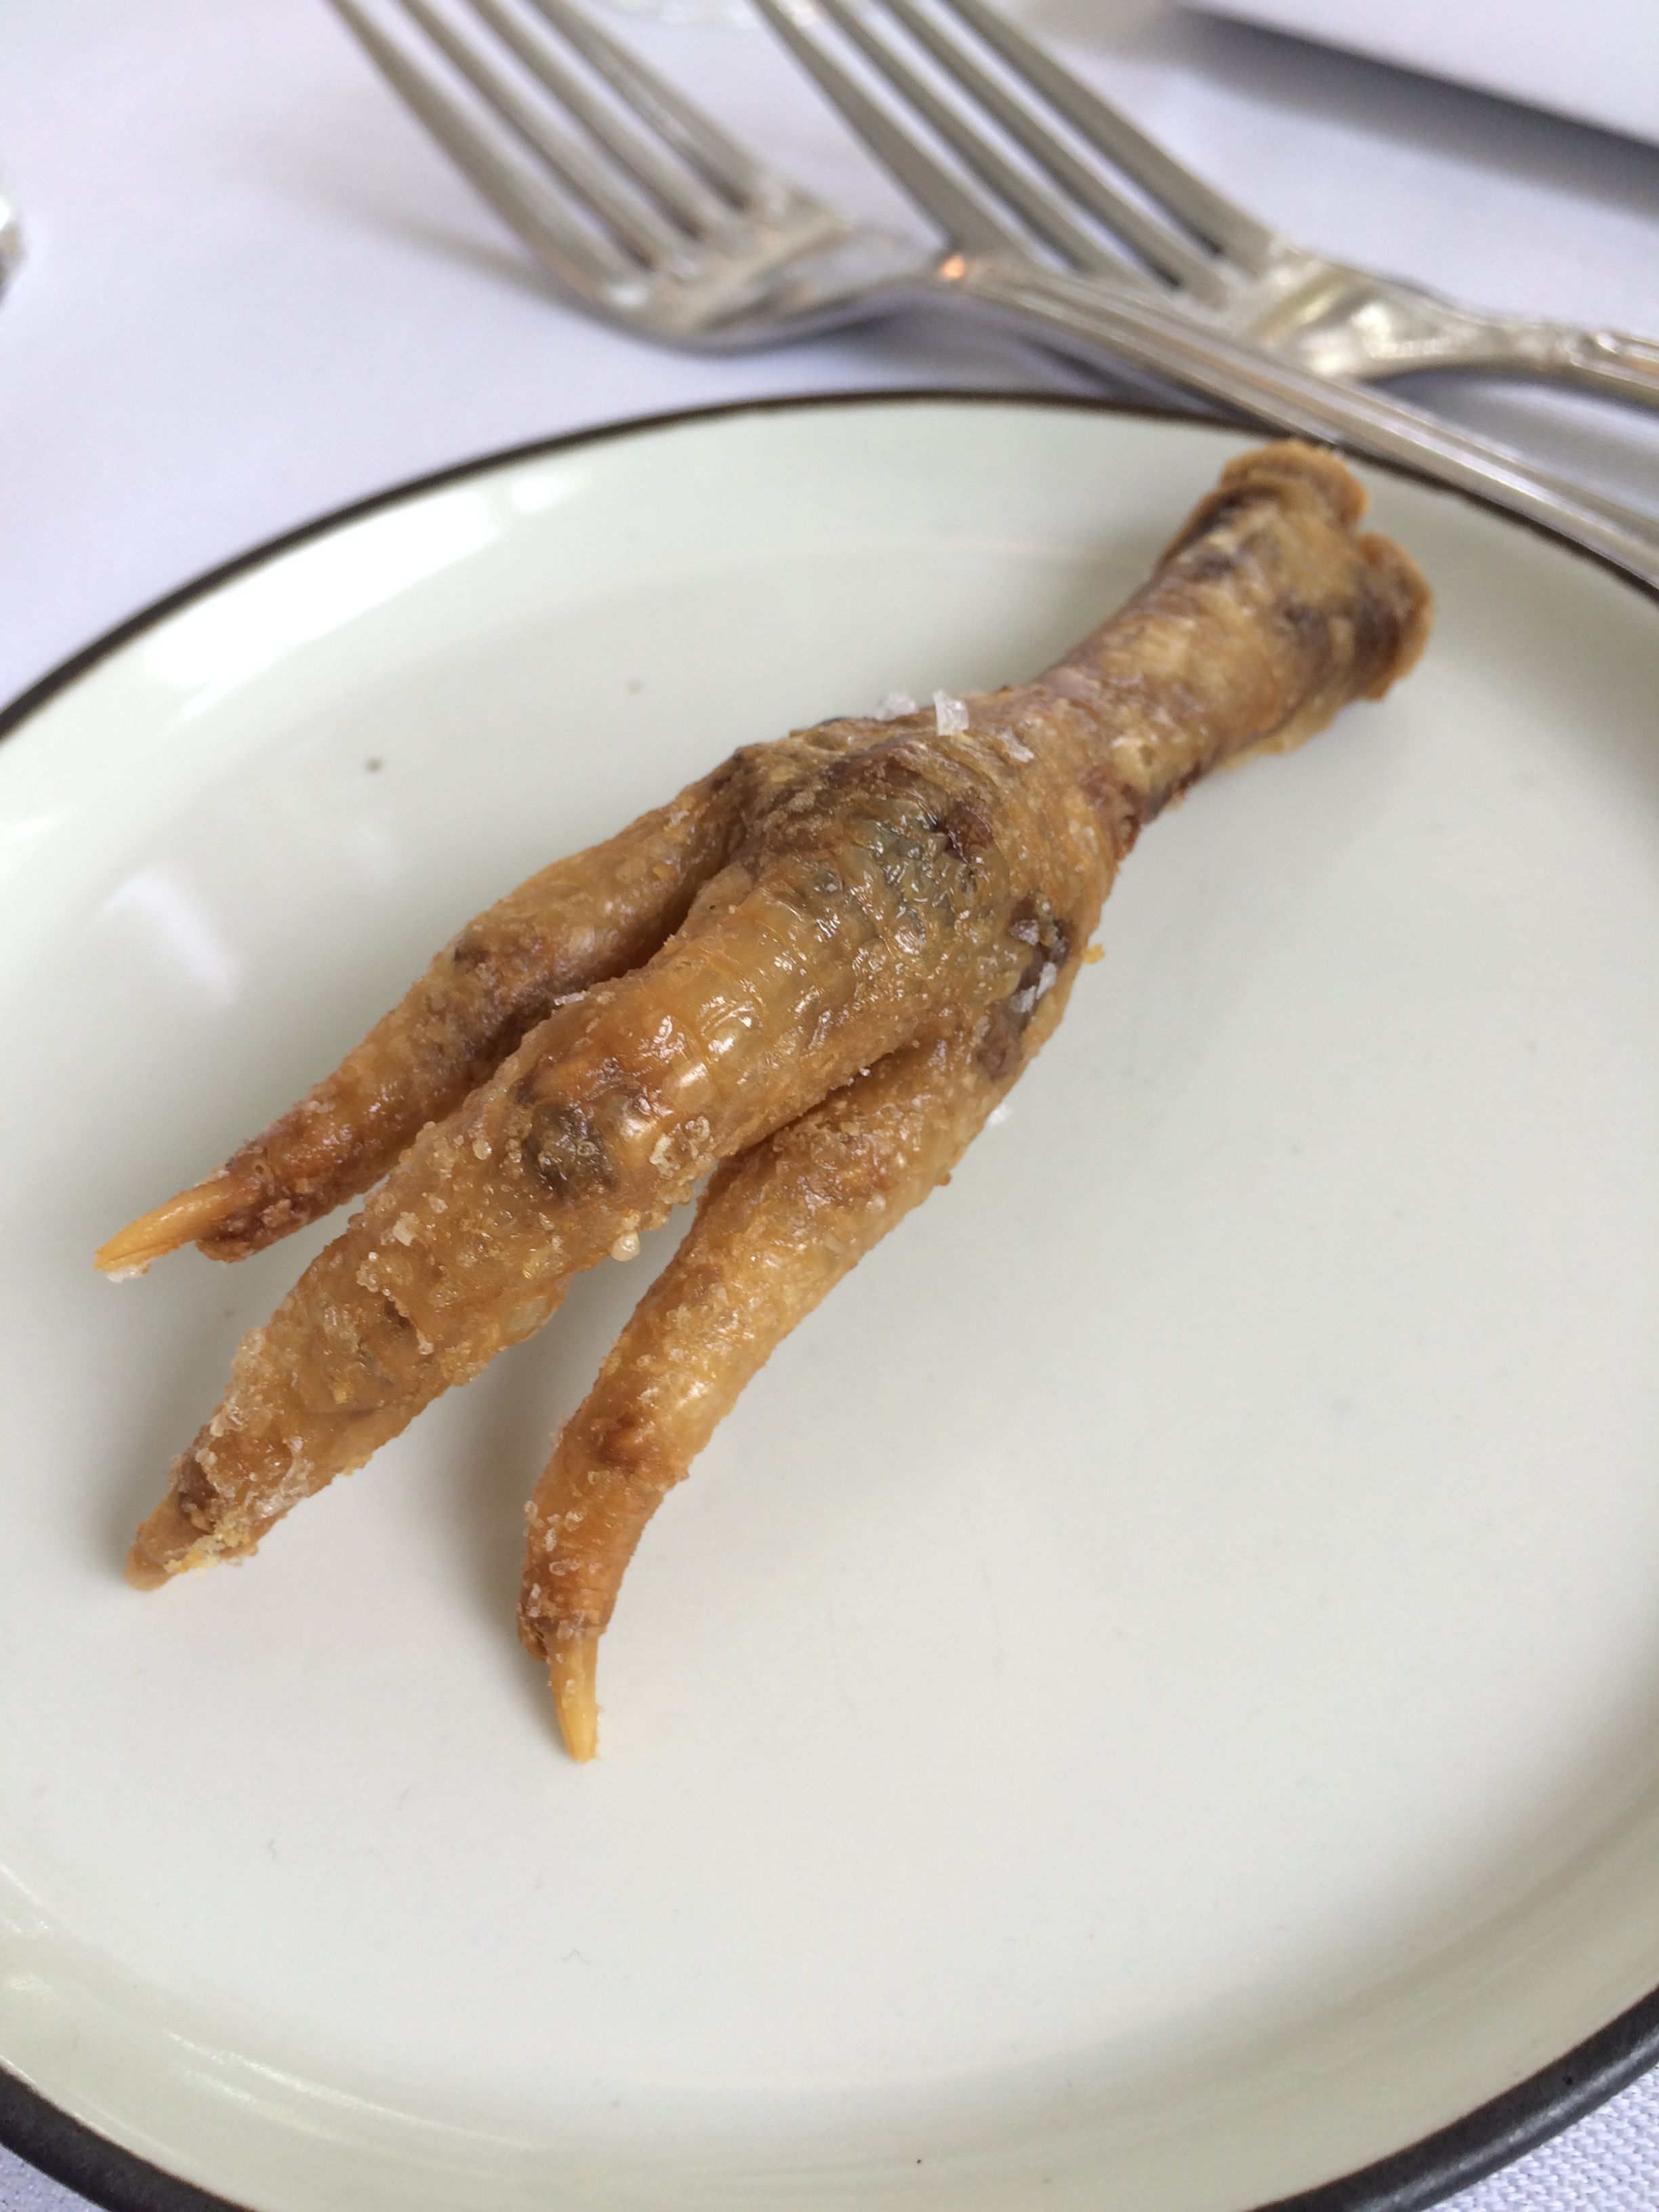 File:Deep Fried Chicken Feet.jpg Wikimedia Commons - 2448x3264 - jpeg